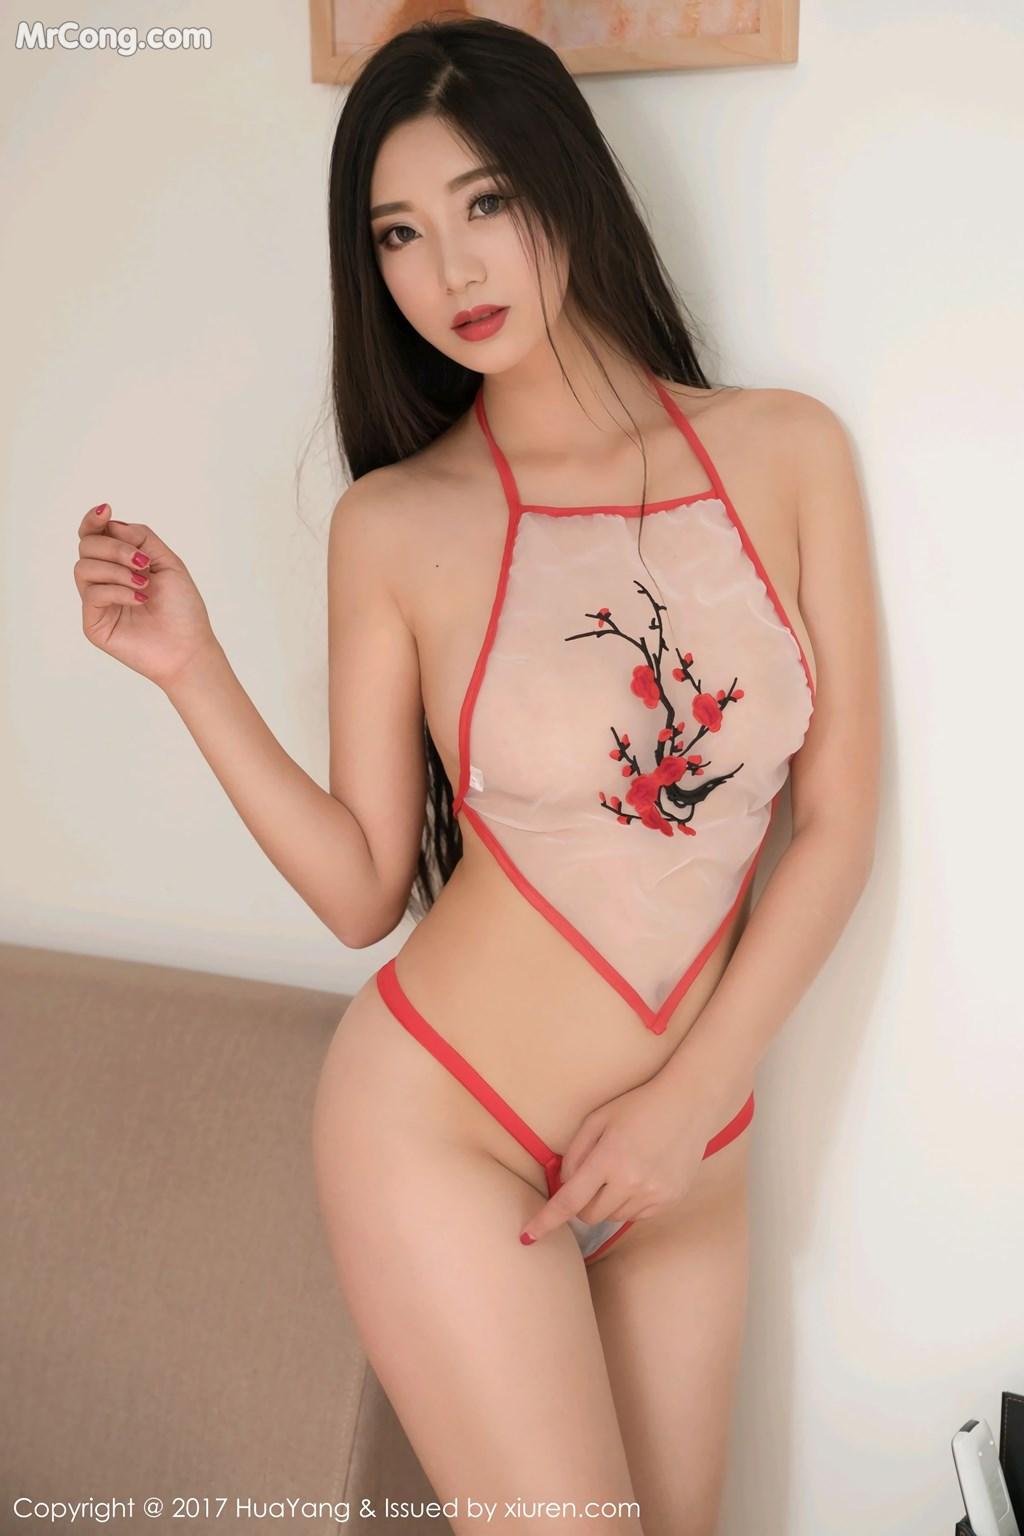 Image HuaYang-2017-11-10-Vol.015-KiKi-MrCong.com-016 in post HuaYang 2017-11-10 Vol.015: Người mẫu 宋-KiKi (45 ảnh)